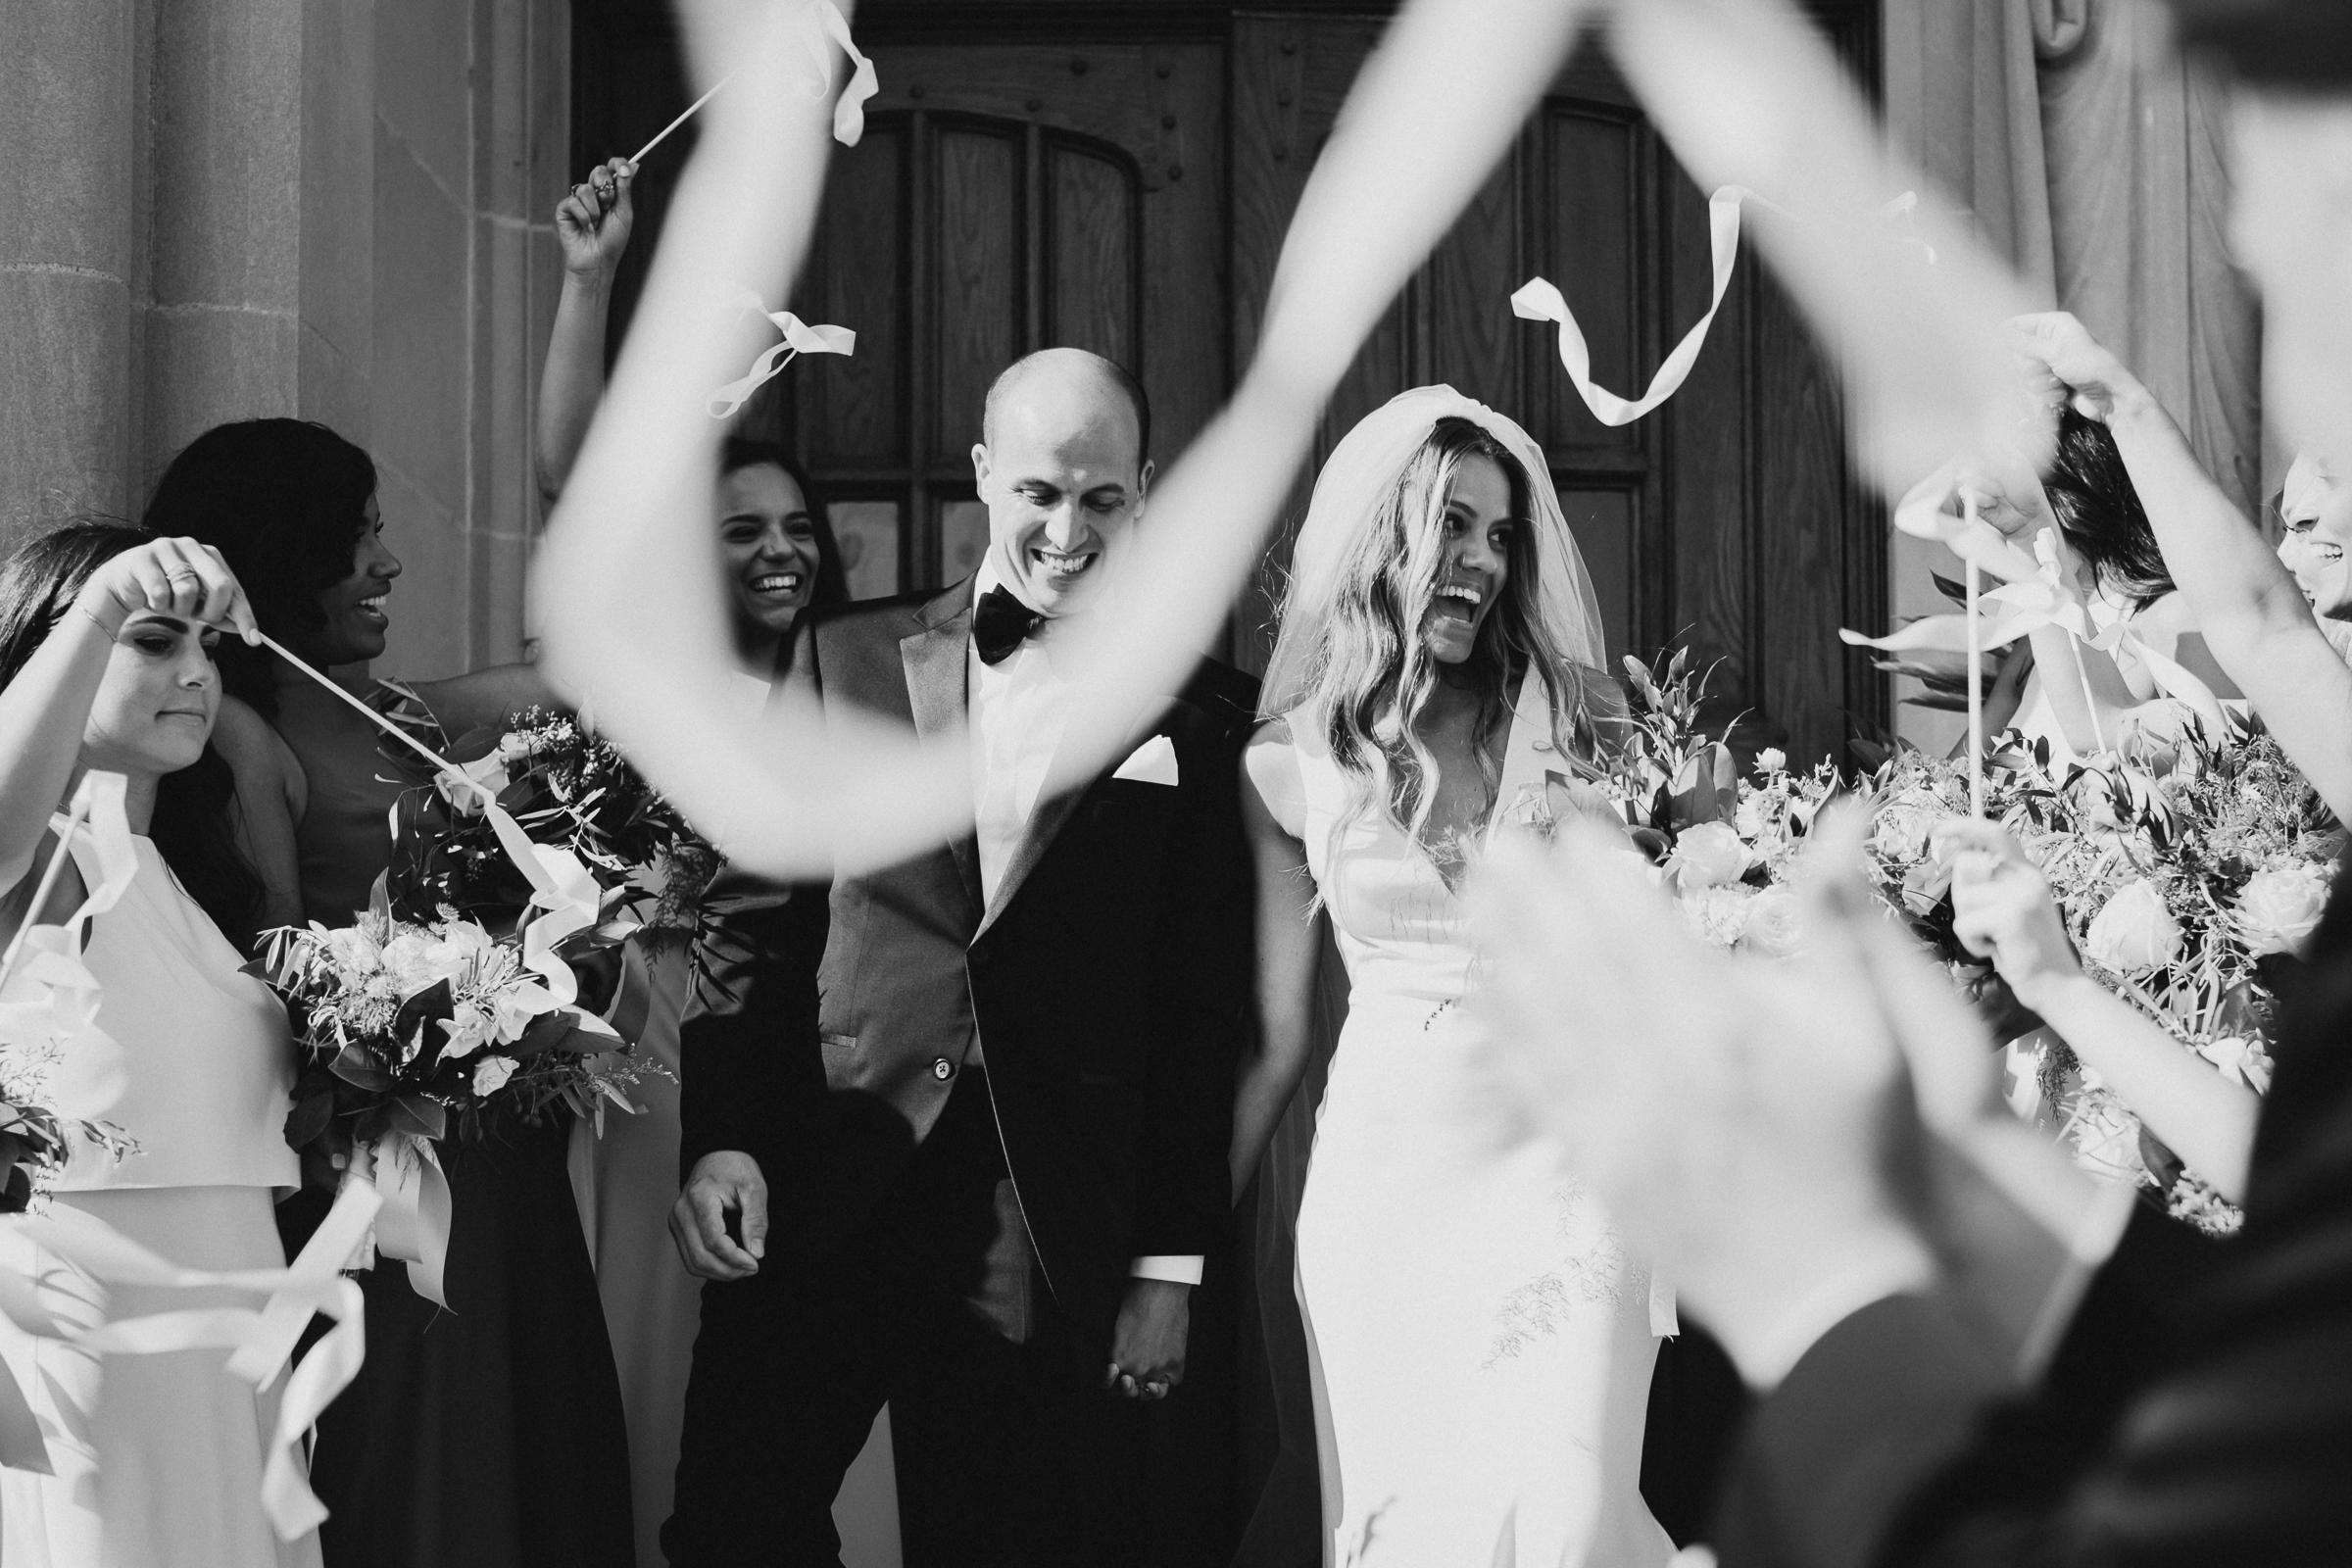 New-York-Documentary-Wedding-Photography-Best-Of-2017-by-Elvira-Kalviste-Photography-4.jpg